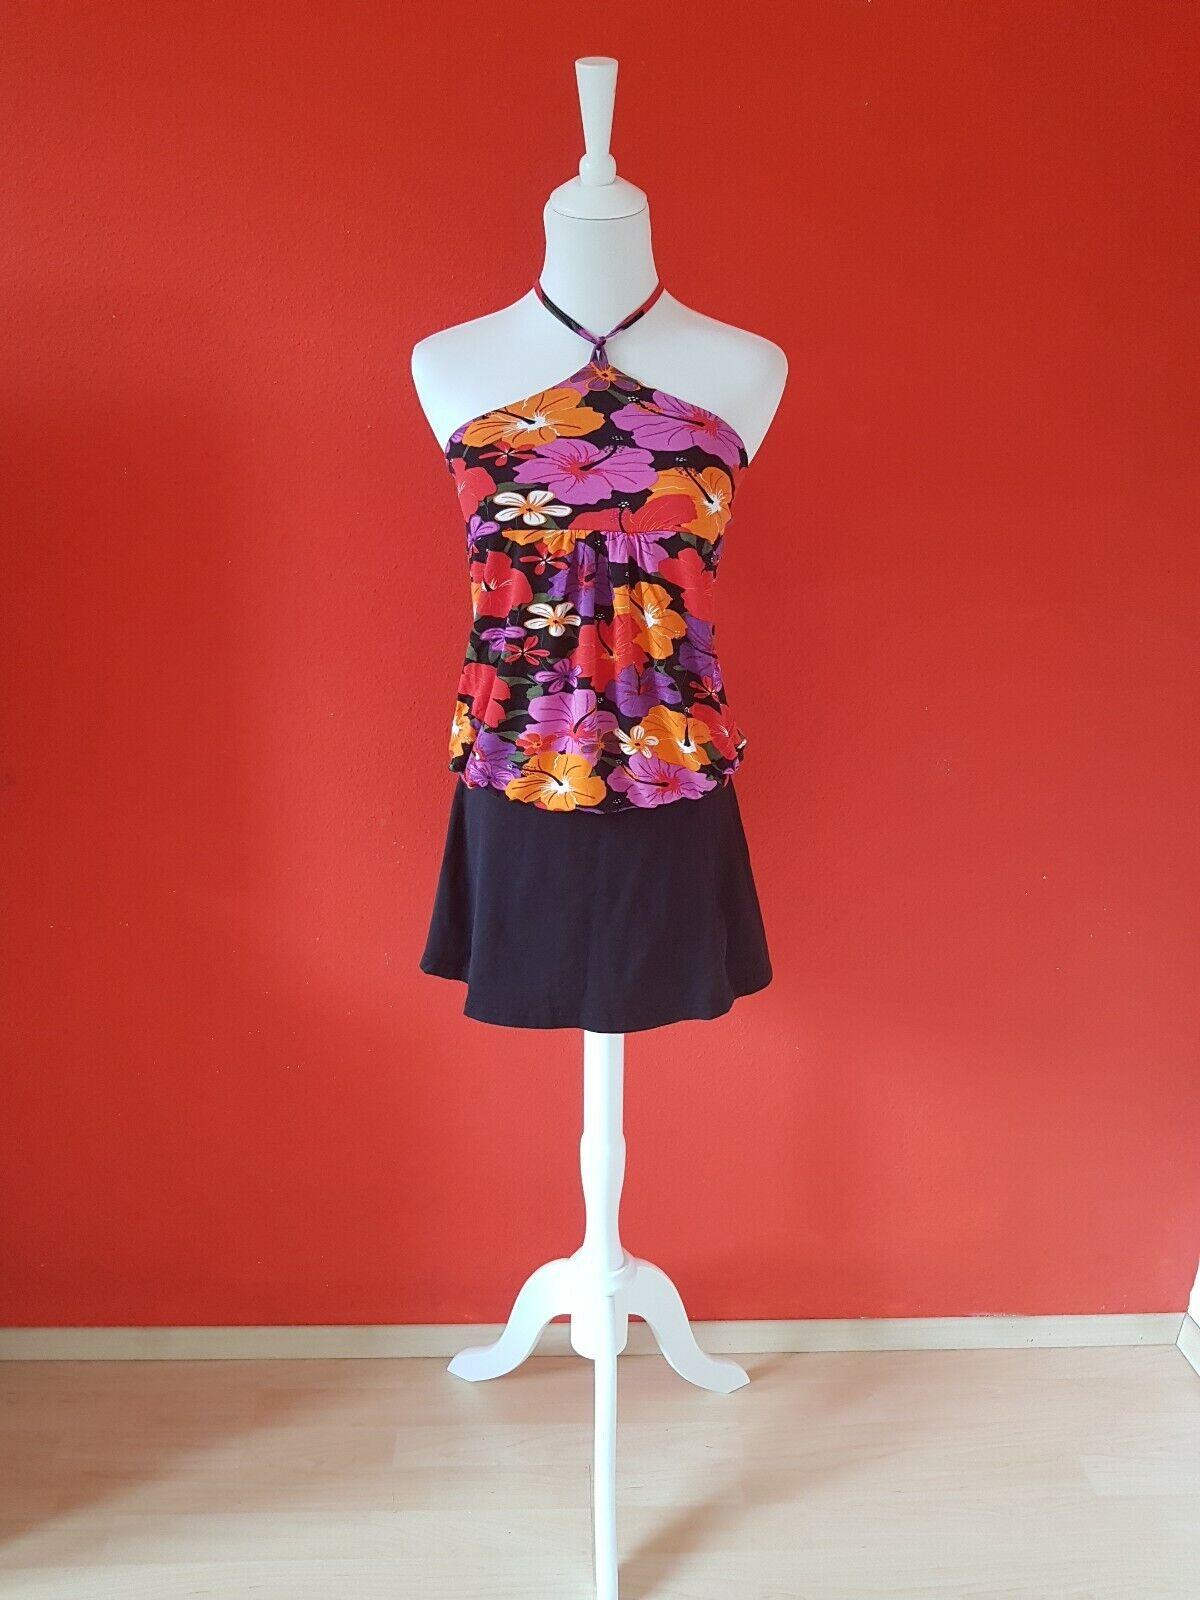 ❤ Orsay Damen Sommer Set Blumen Hibiskus Top Shirt Mini Rock schwarz Gr. 34 XS ❤